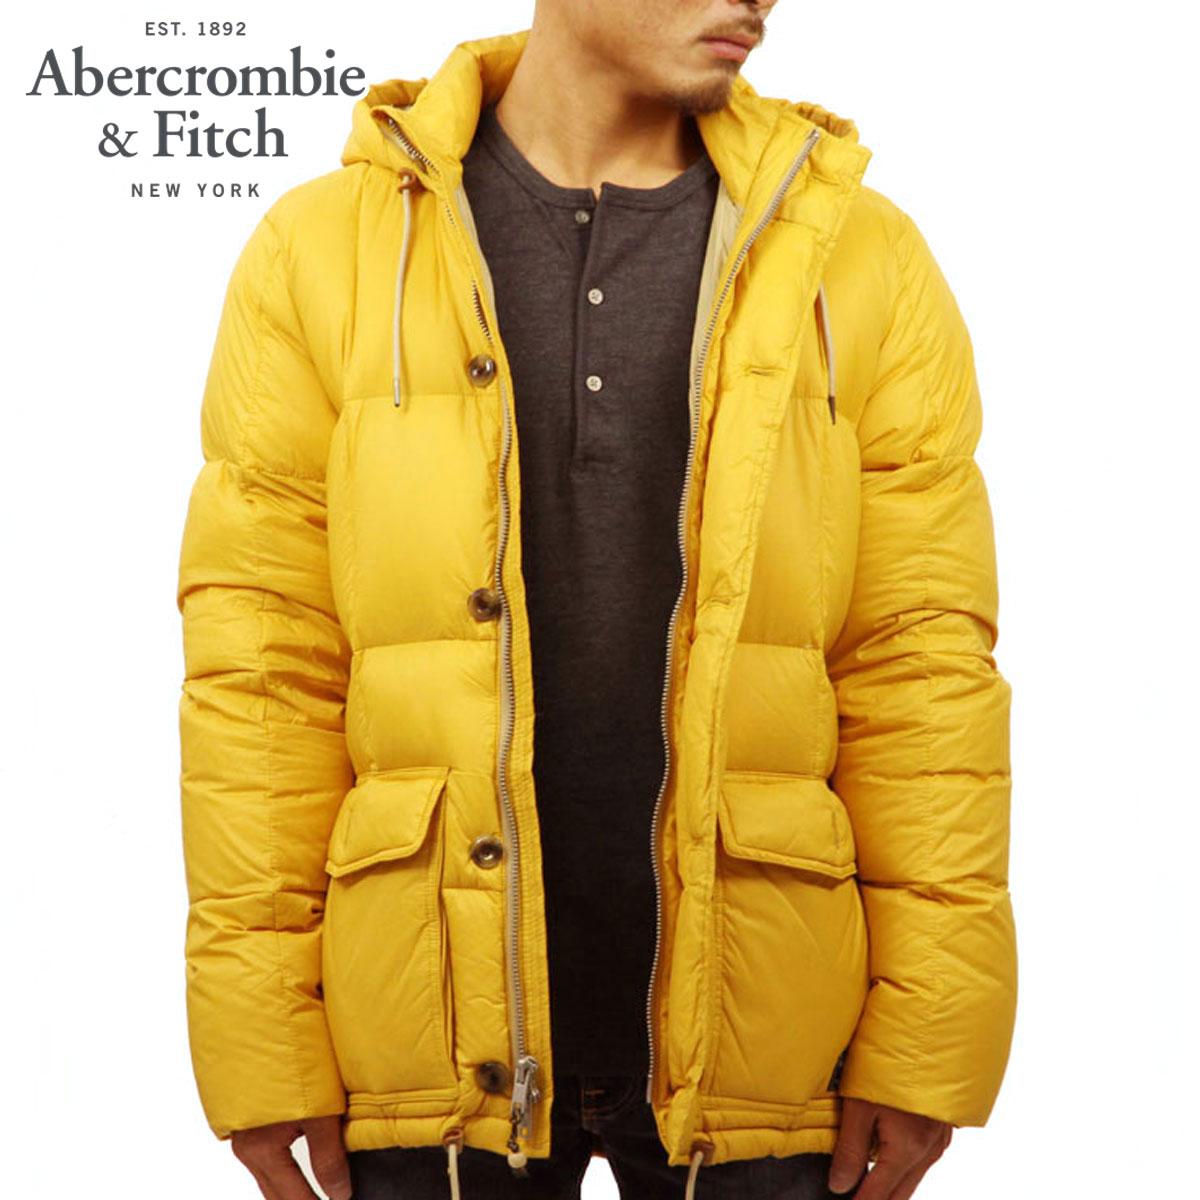 9691046da 20%OFF sale ABBA black outer men's regular article Abercrombie & Fitch  jacket jacket DOWN PUFFER JACKET 132-328-1035-800 D00S20